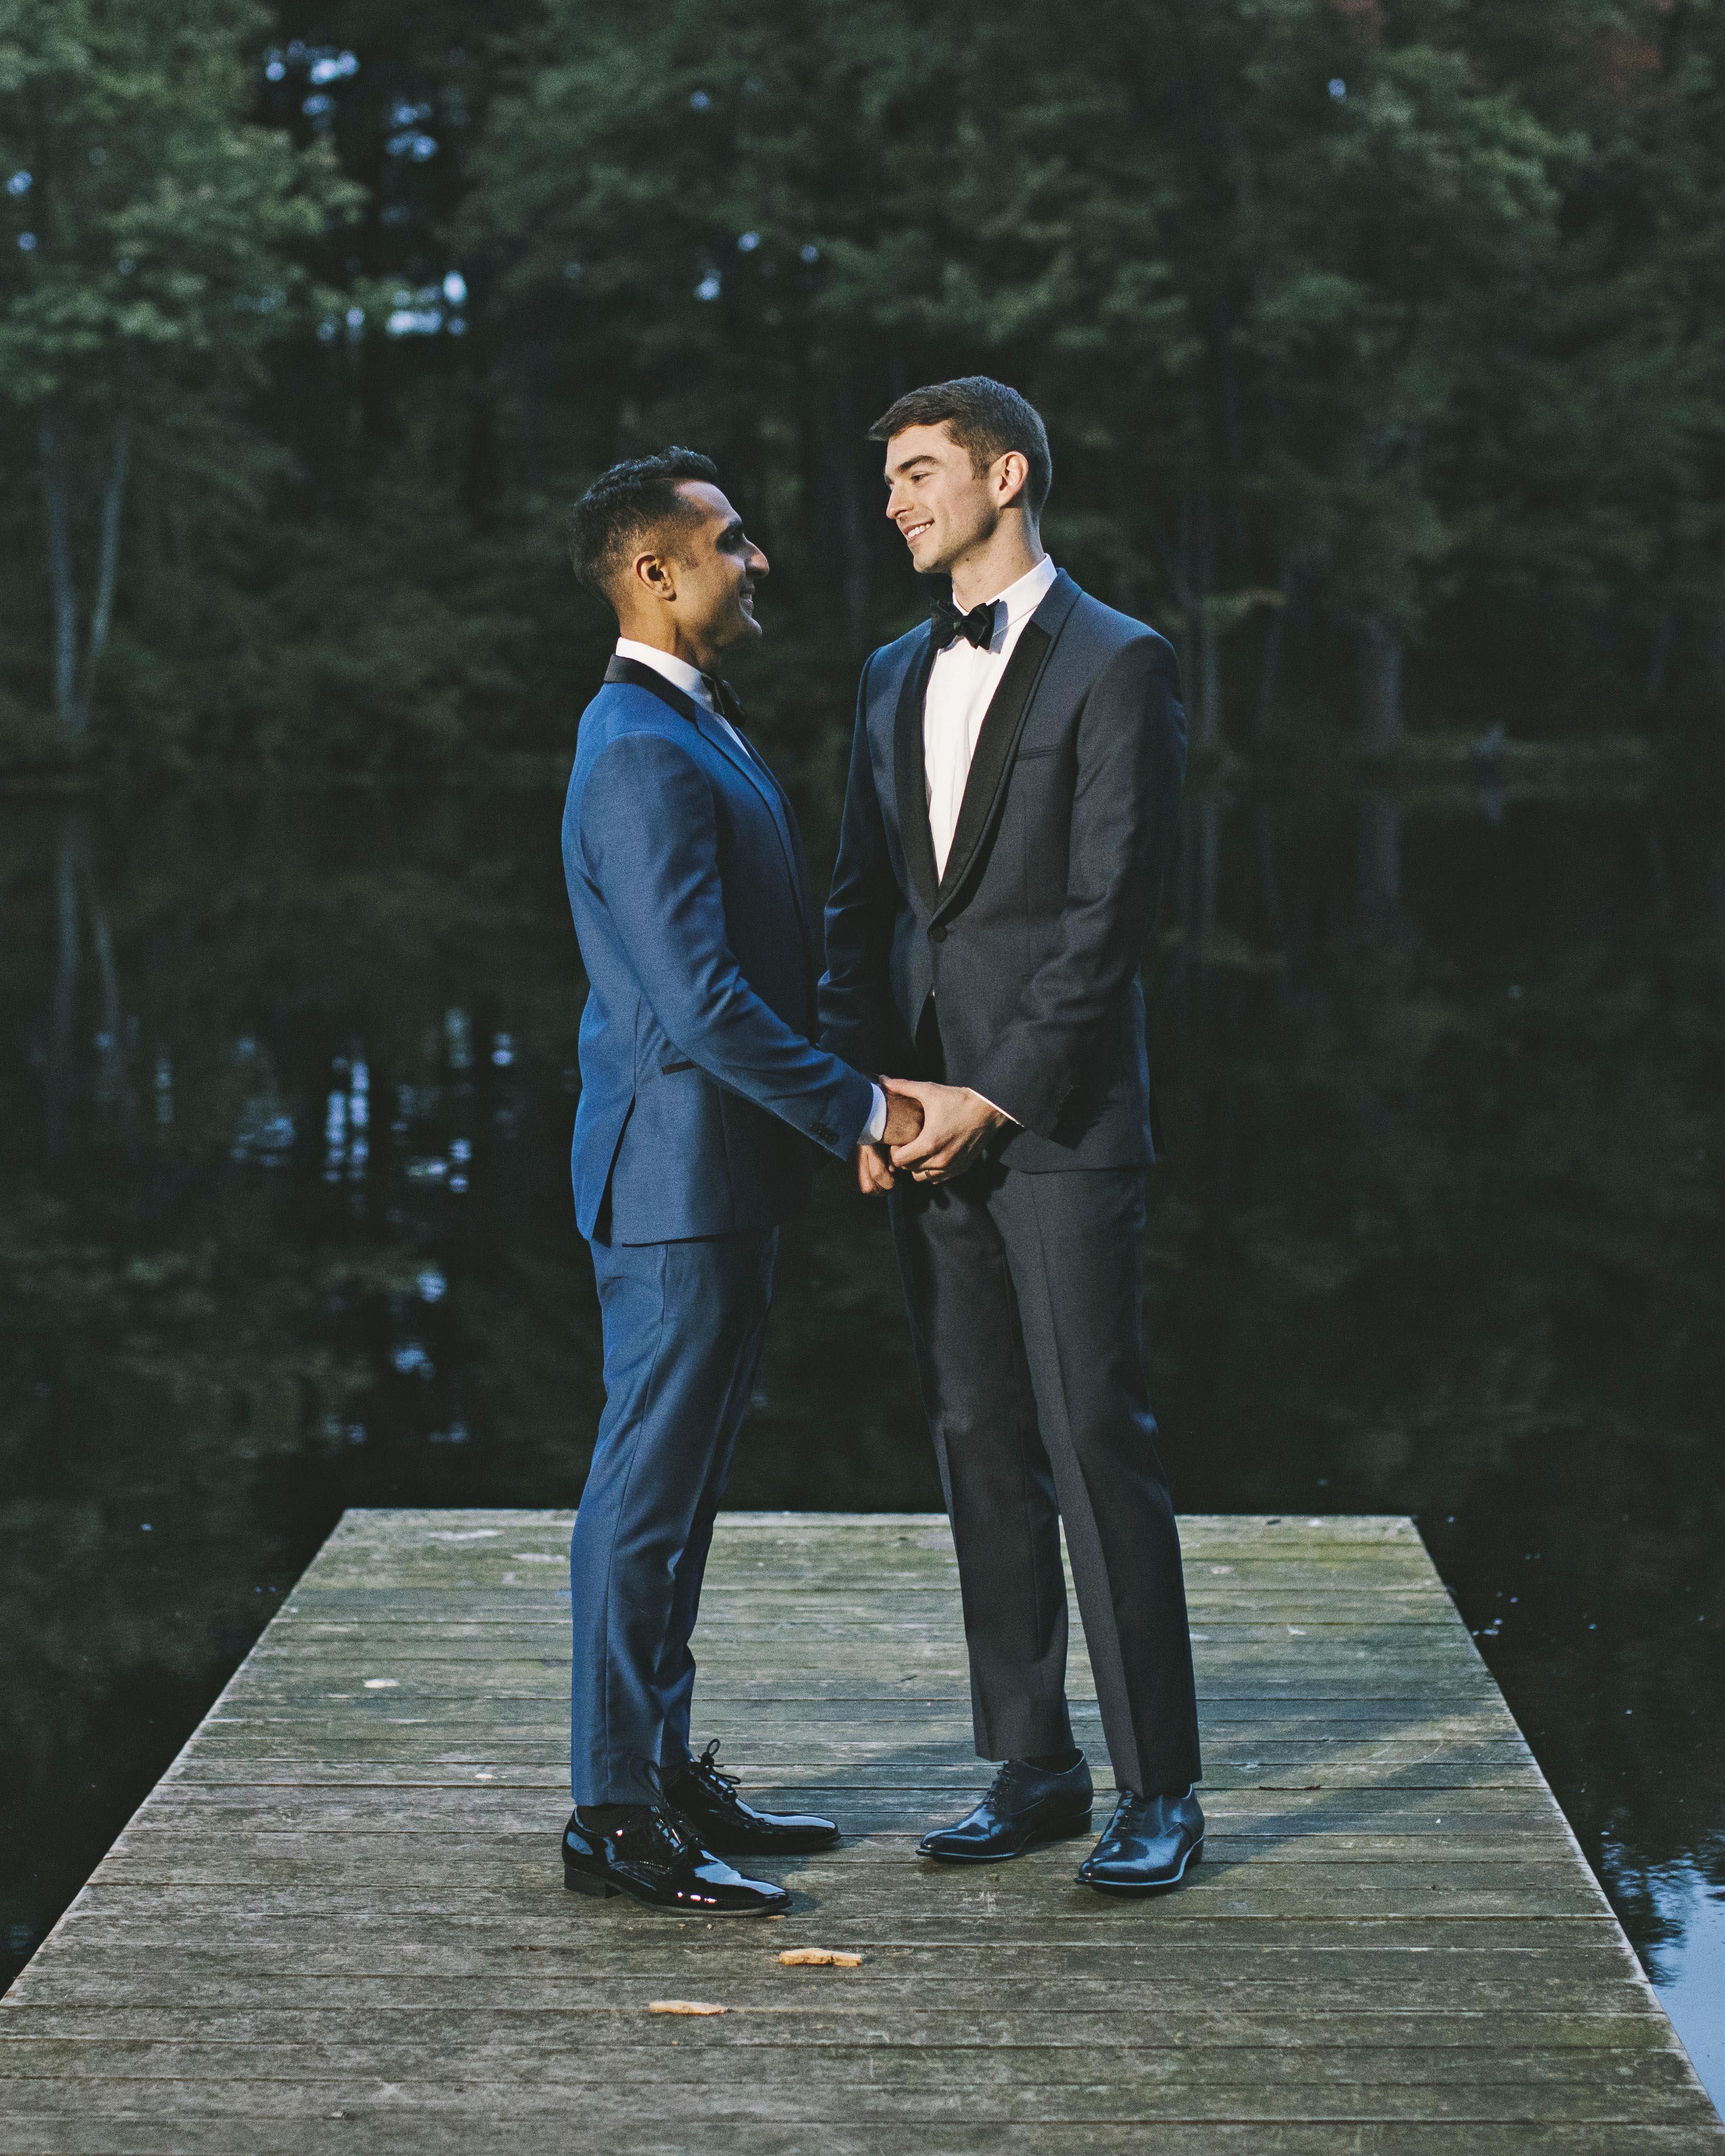 sanjay steven wedding grooms on dock at night